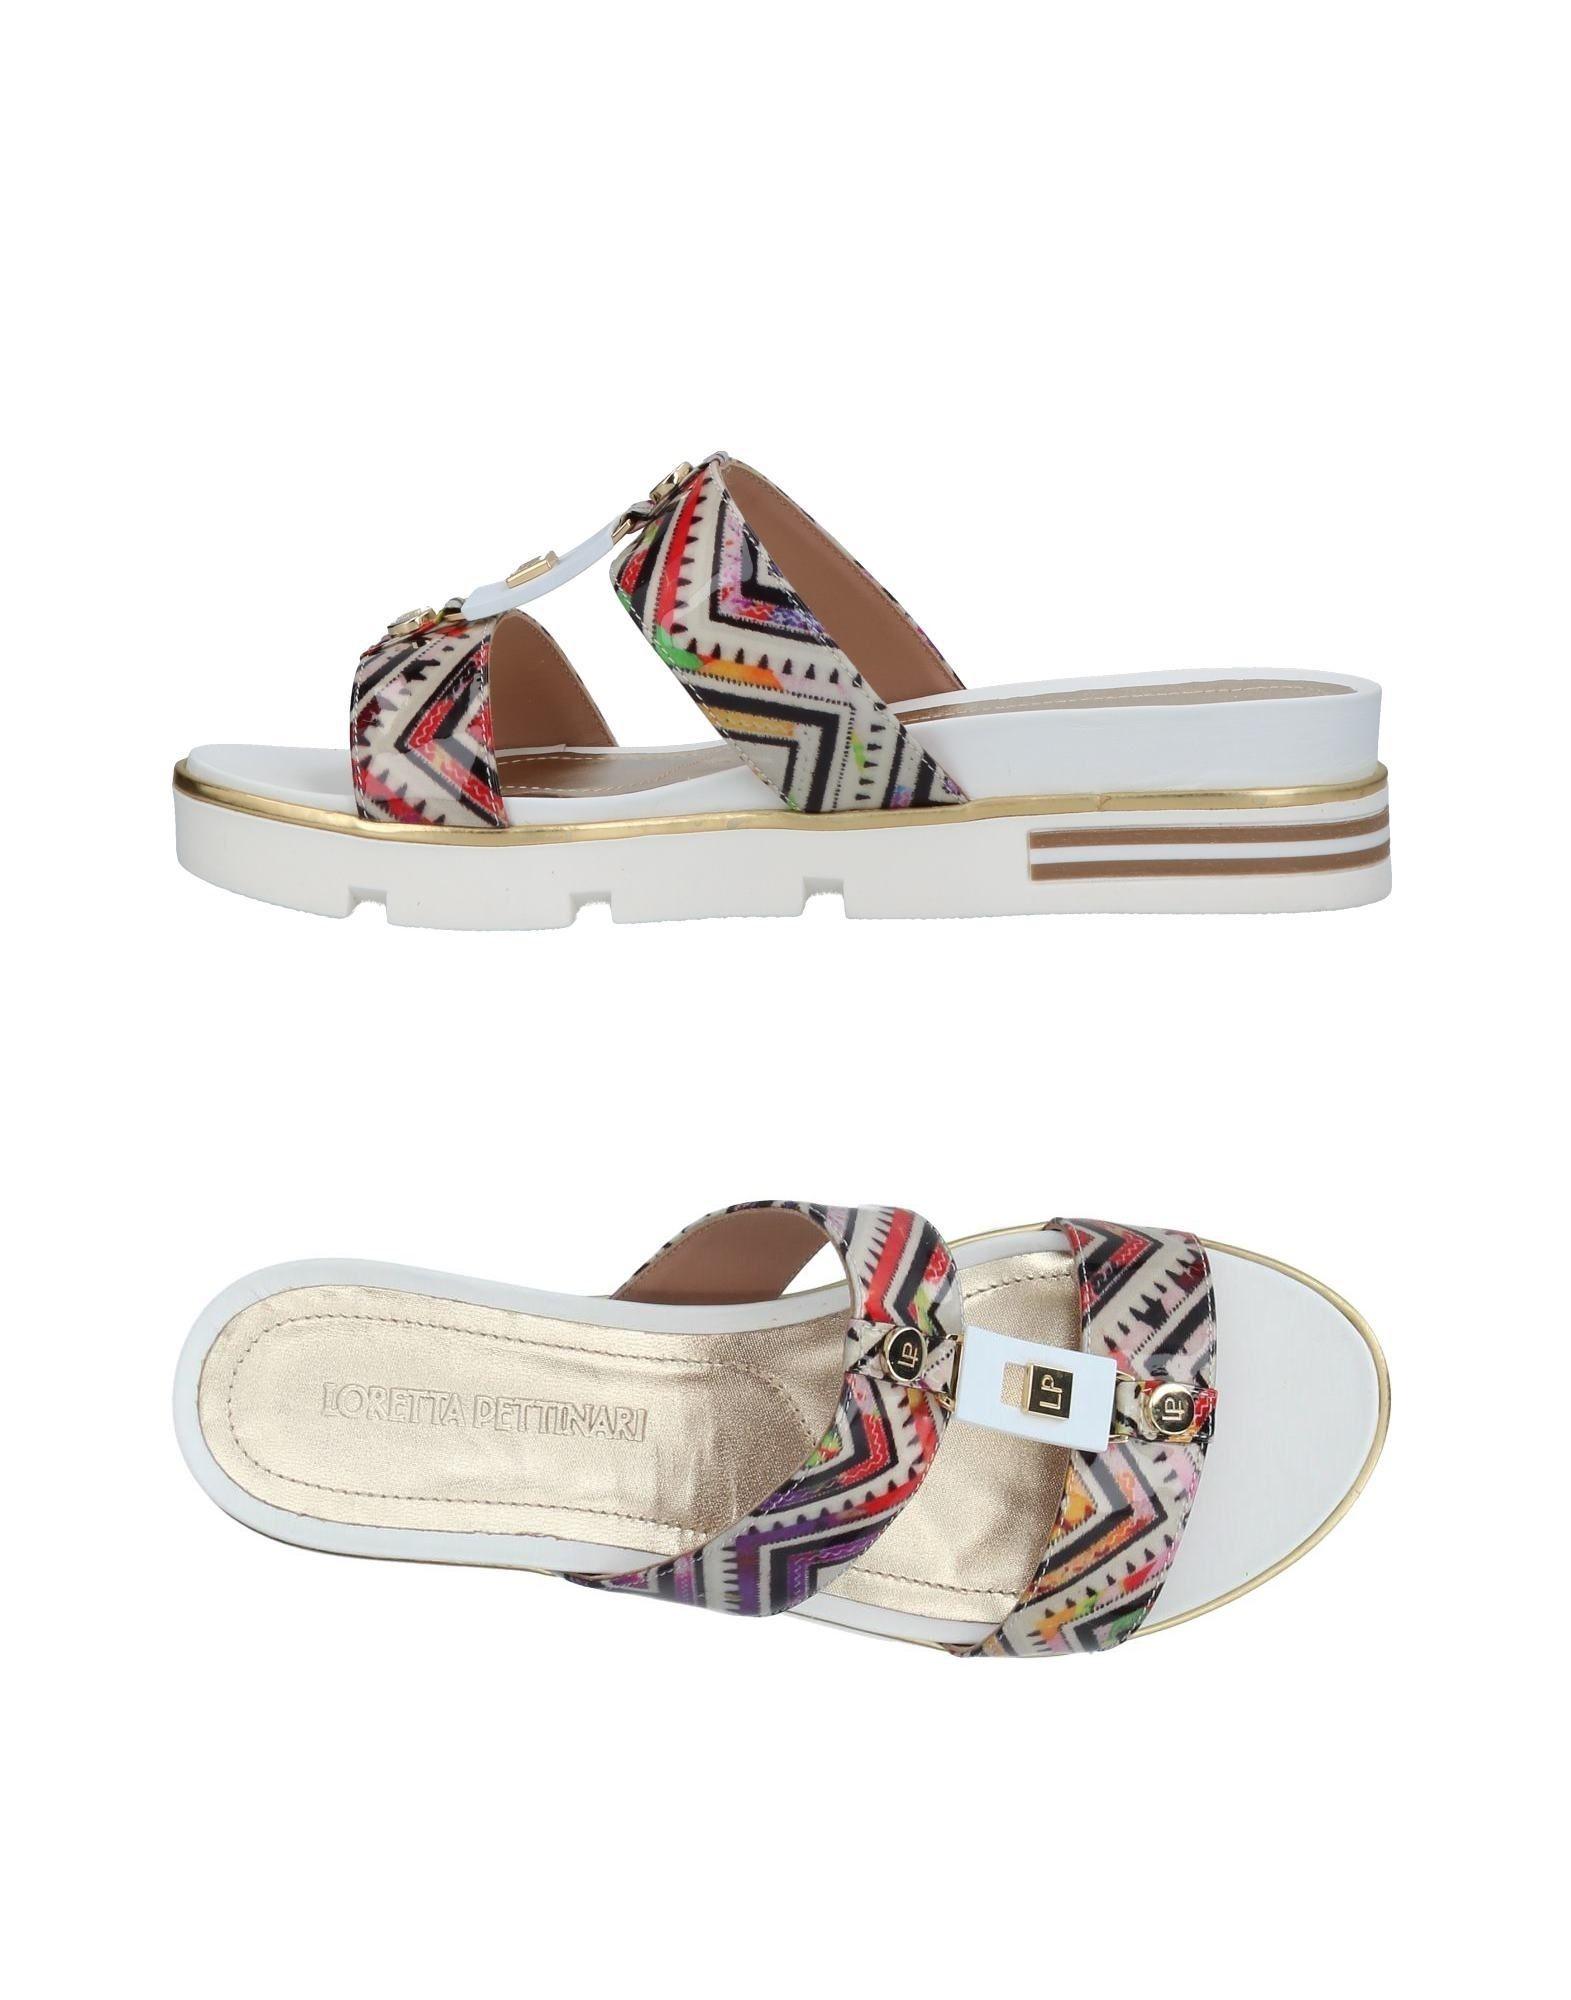 Loretta Pettinari Sandalen Damen  11385893PV Gute Qualität beliebte Schuhe